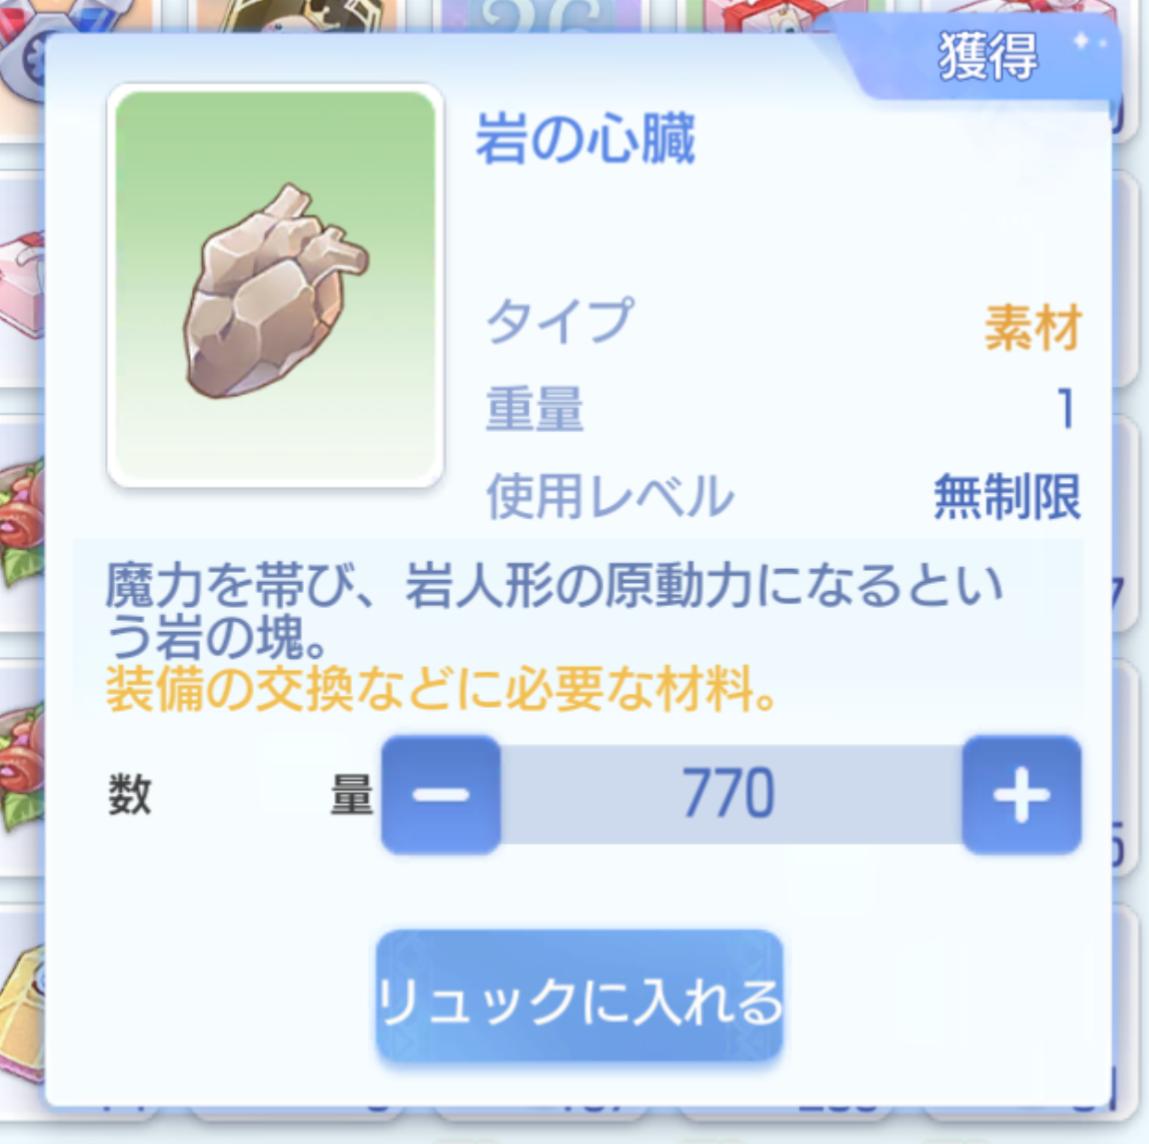 f:id:yamada_ragnarok:20210811053029p:plain